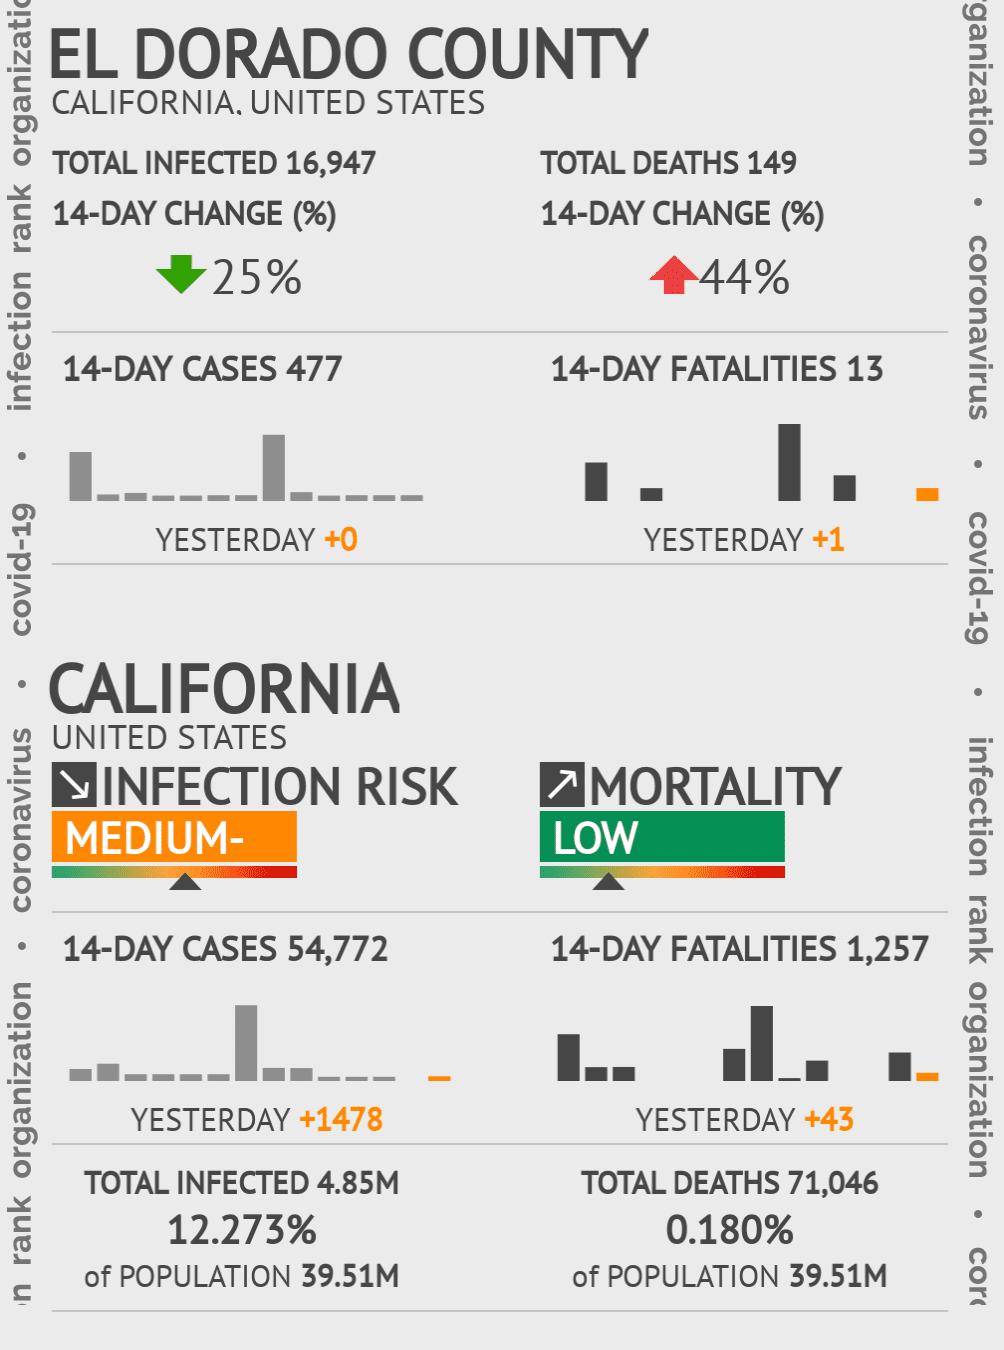 El Dorado County Coronavirus Covid-19 Risk of Infection on October 16, 2020